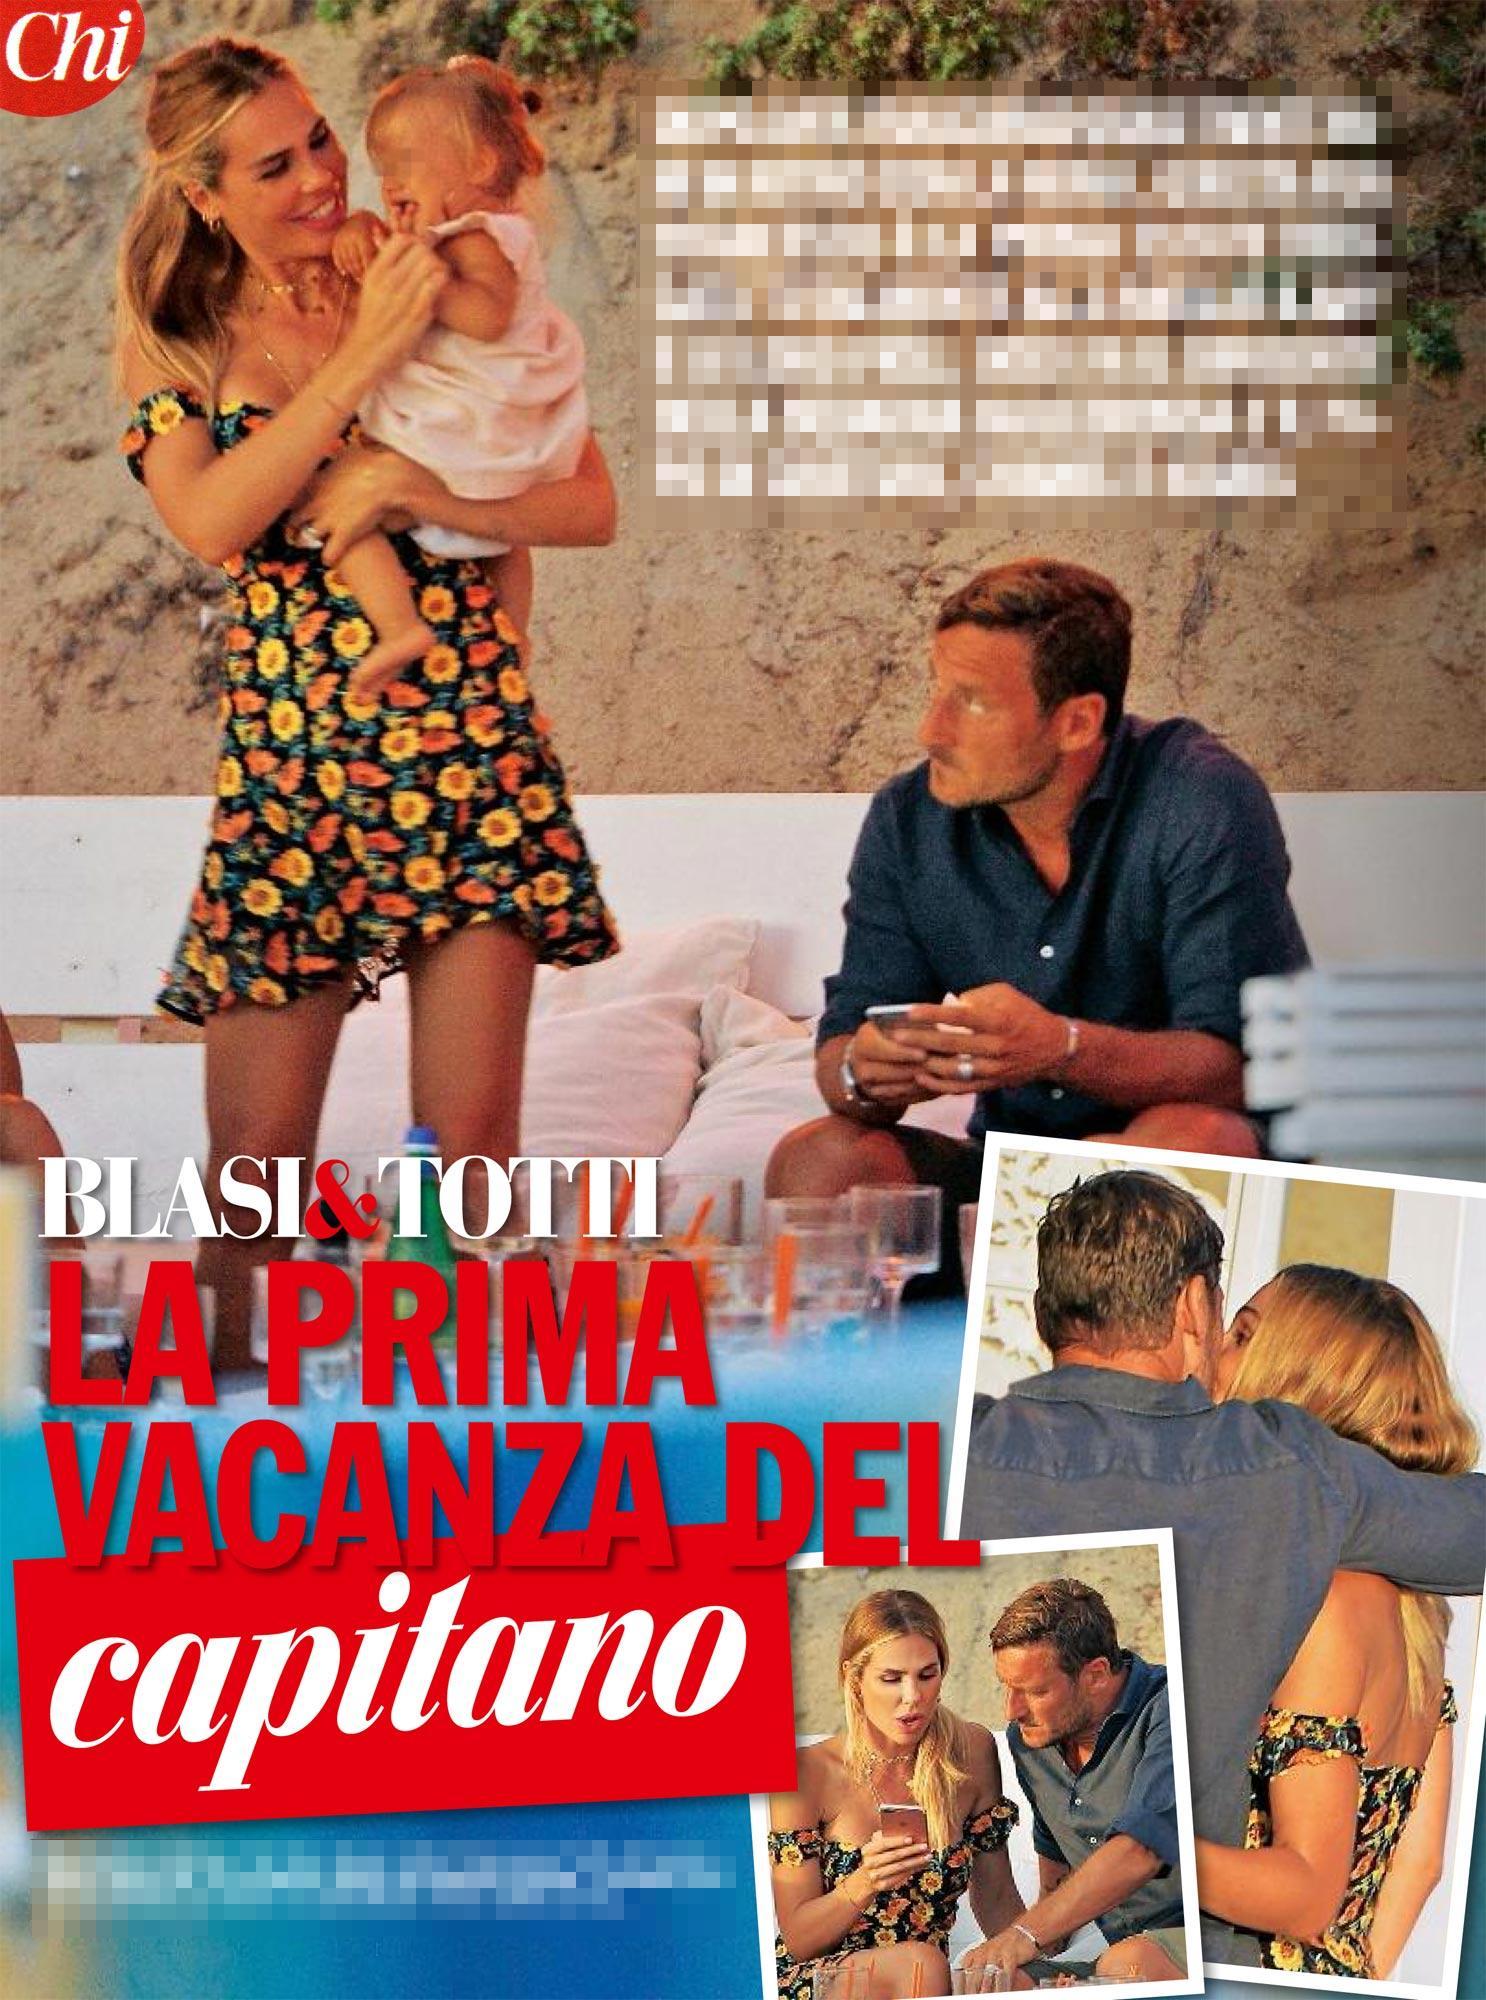 Ilary Blasi e Francesco Totti si scatenano in spiaggia a Sabaudia